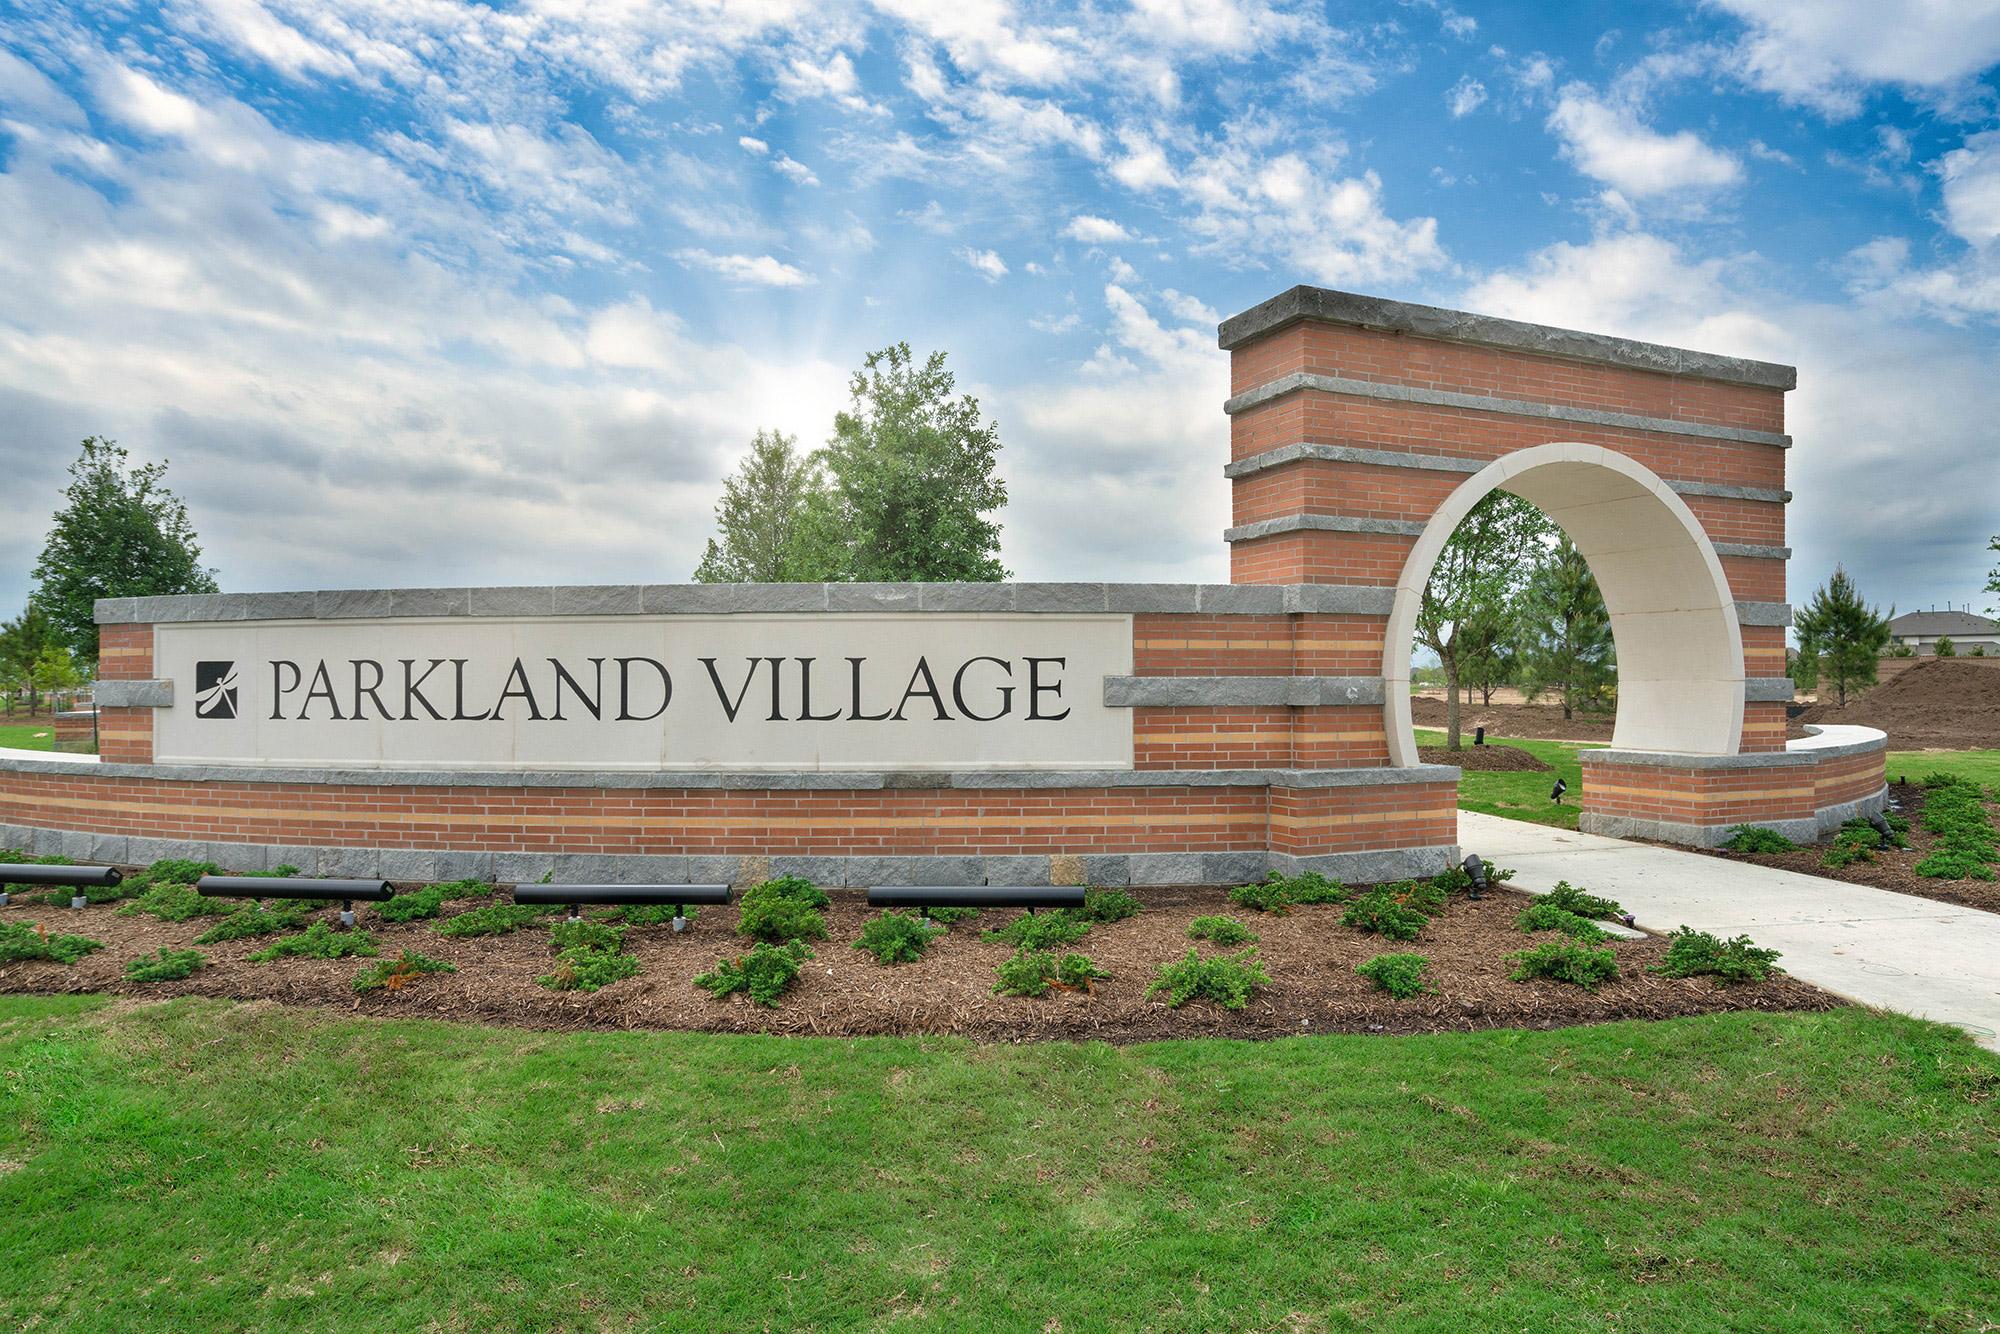 Bridgeland - Parkland Village Entrance